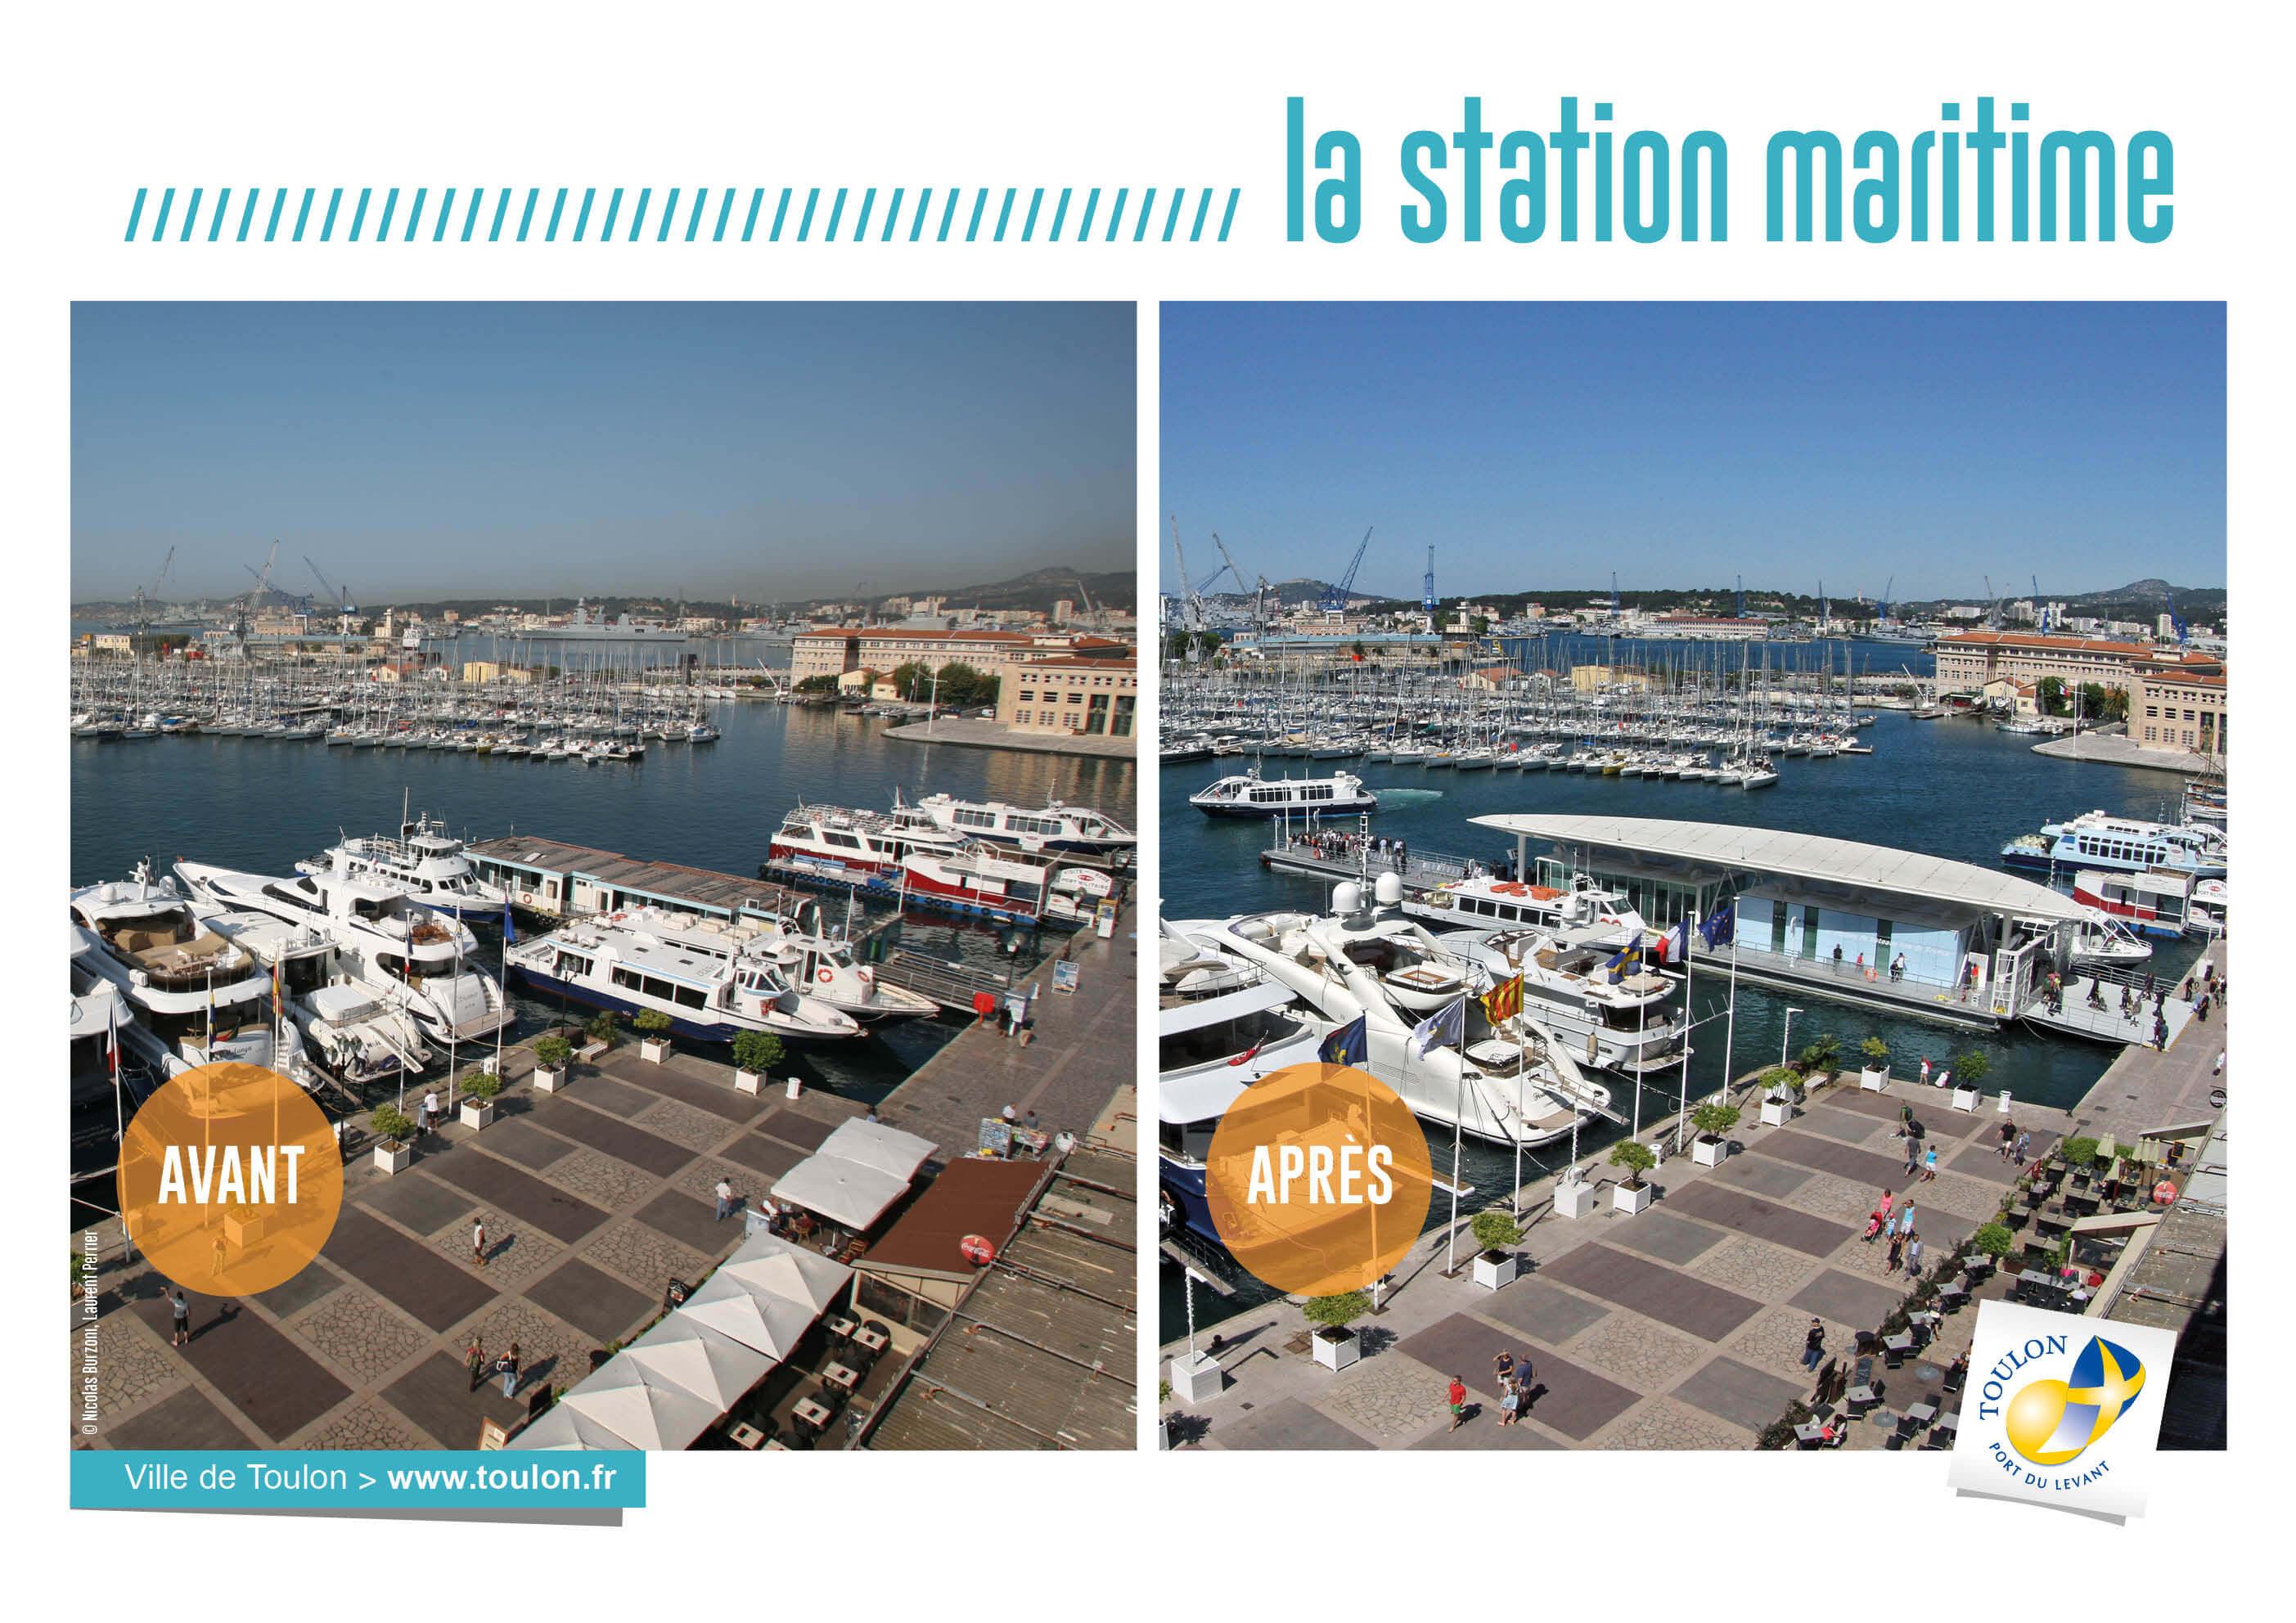 La station maritime